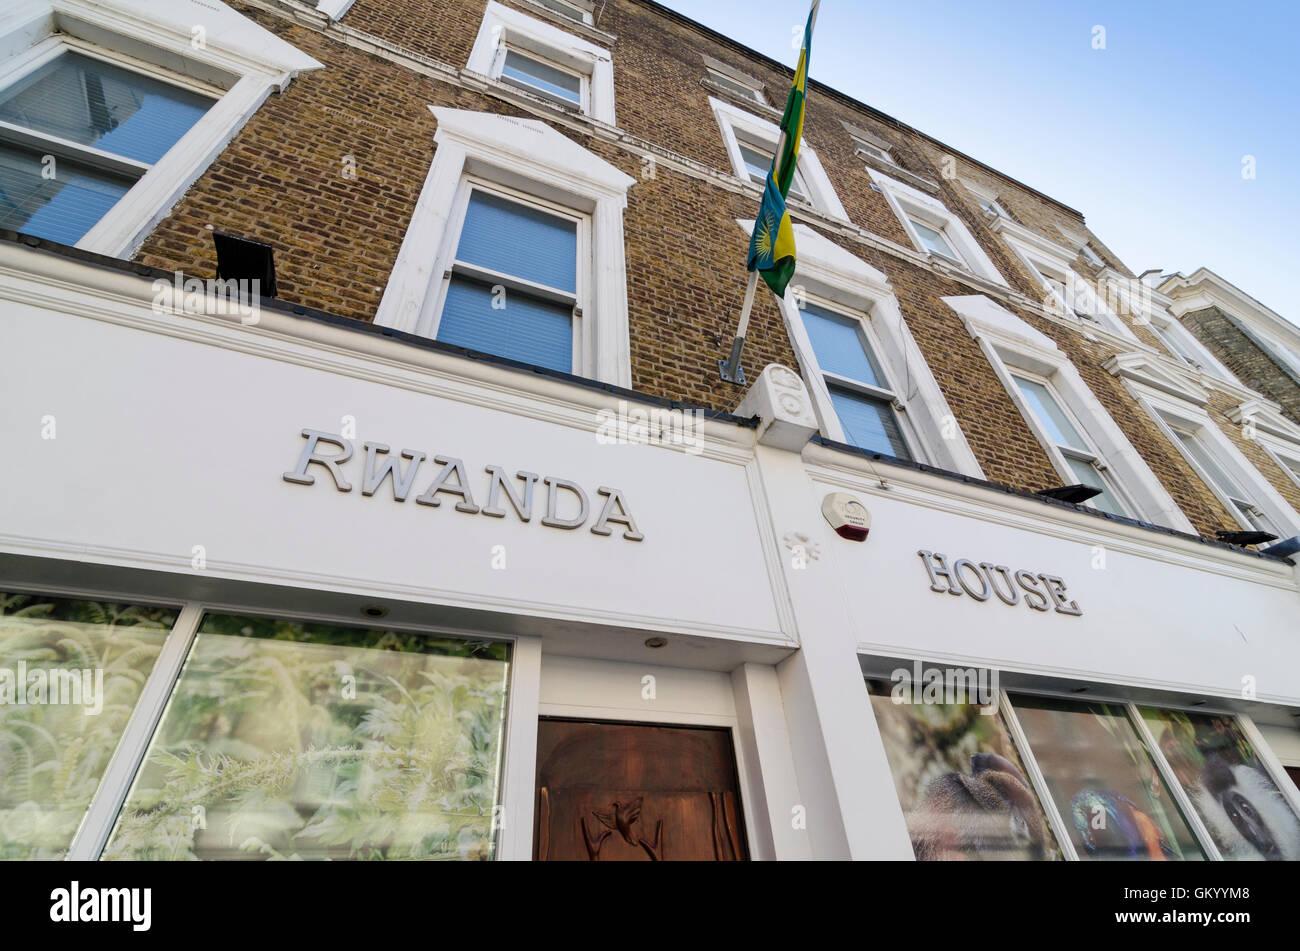 Rwanda House, London, UK Stock Photo